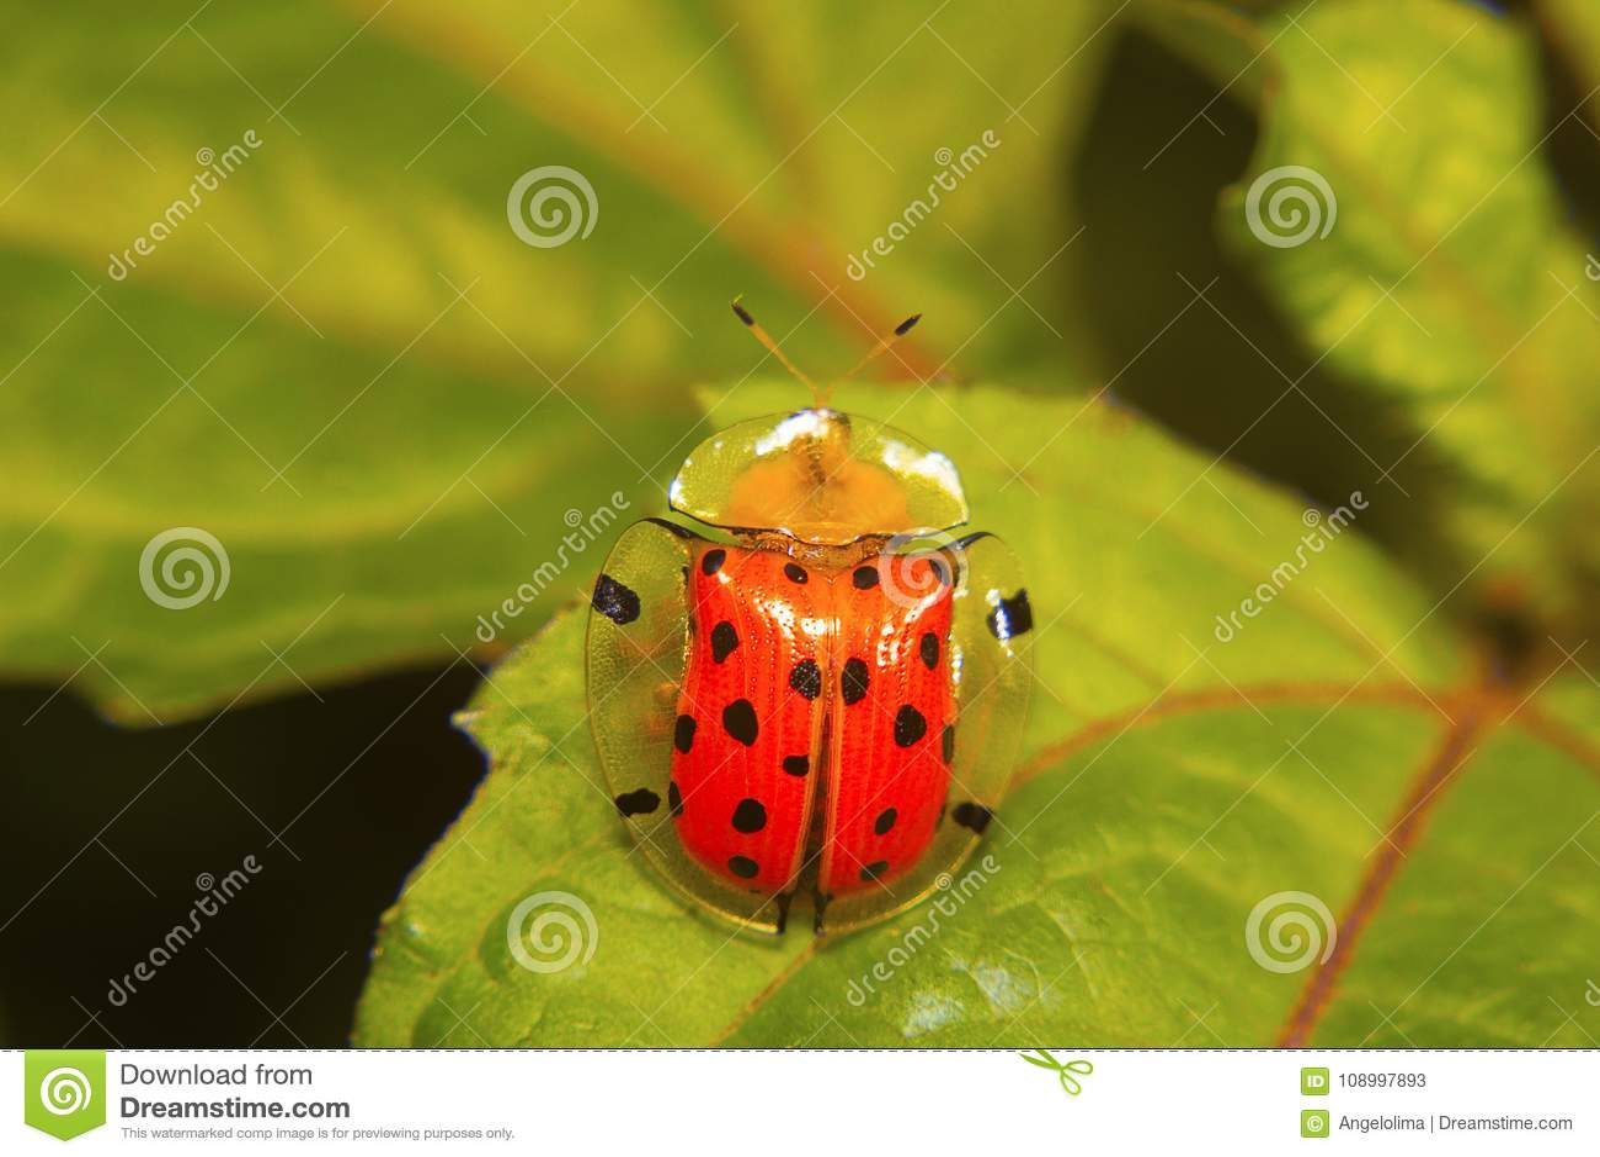 Schildkröte Shell Beetle Aspidomorpha-miliaris Aarey-Kolonie, Mumbai, Maharashtra